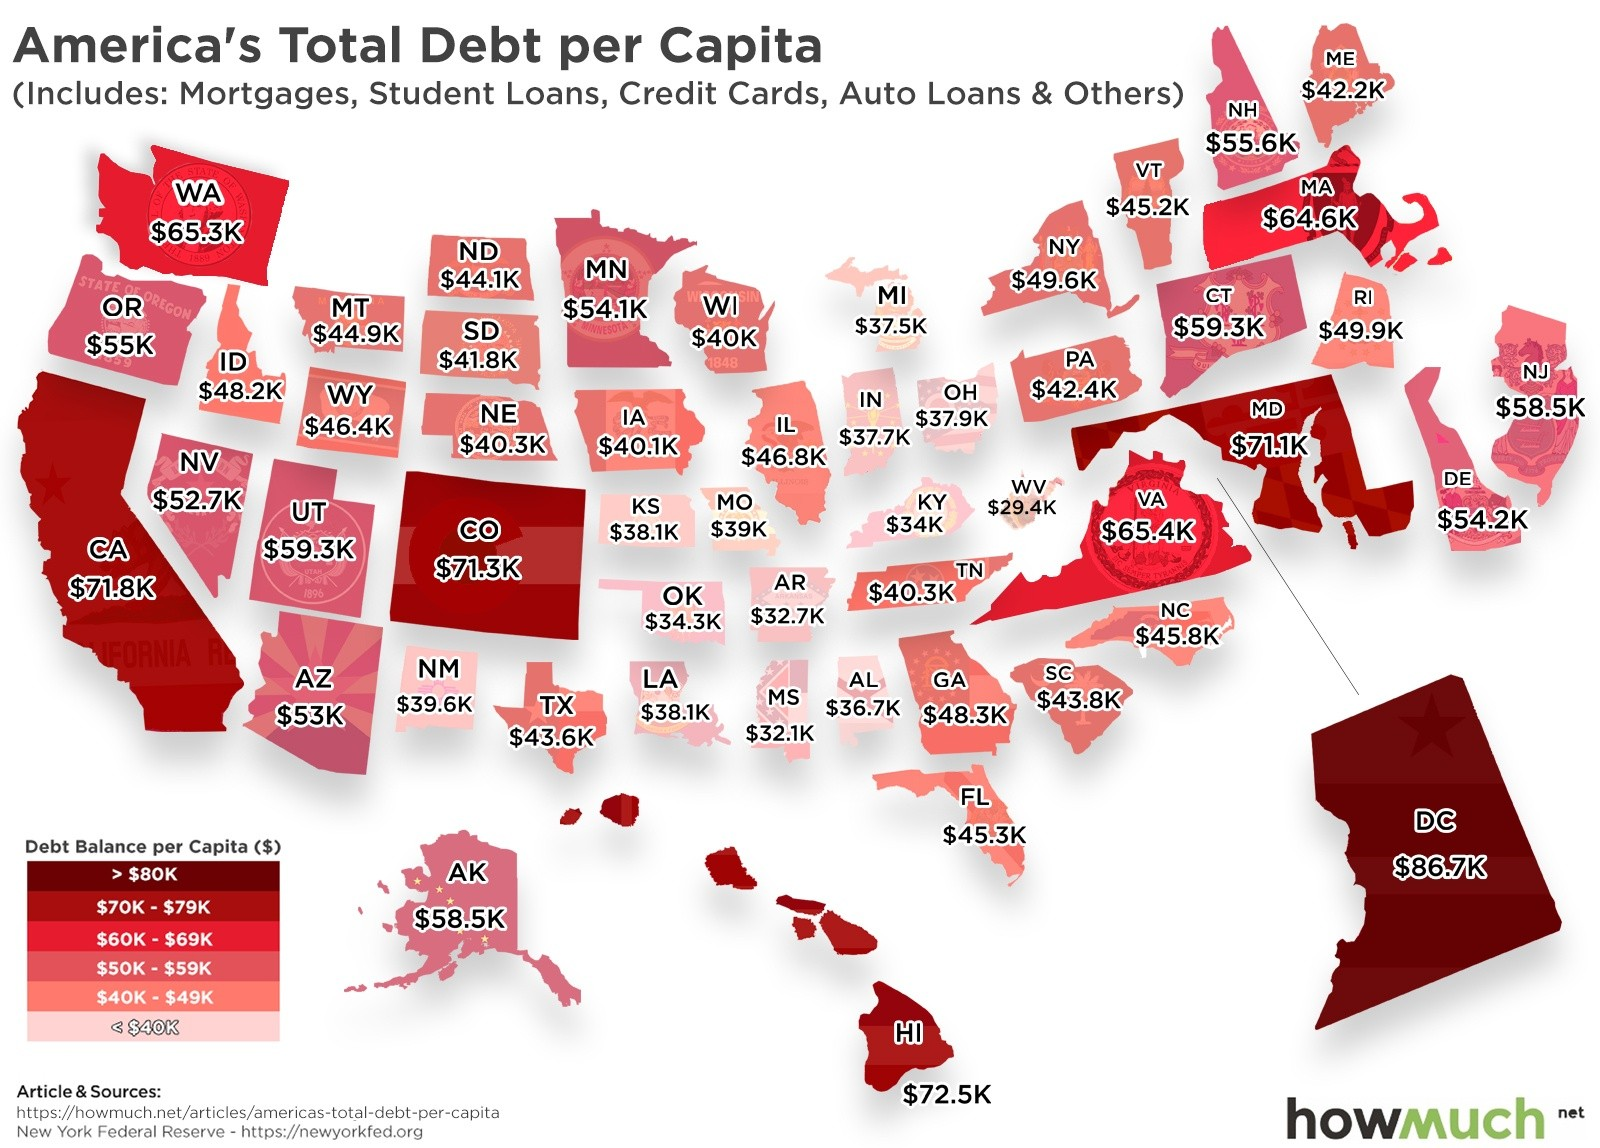 Total debt per capita